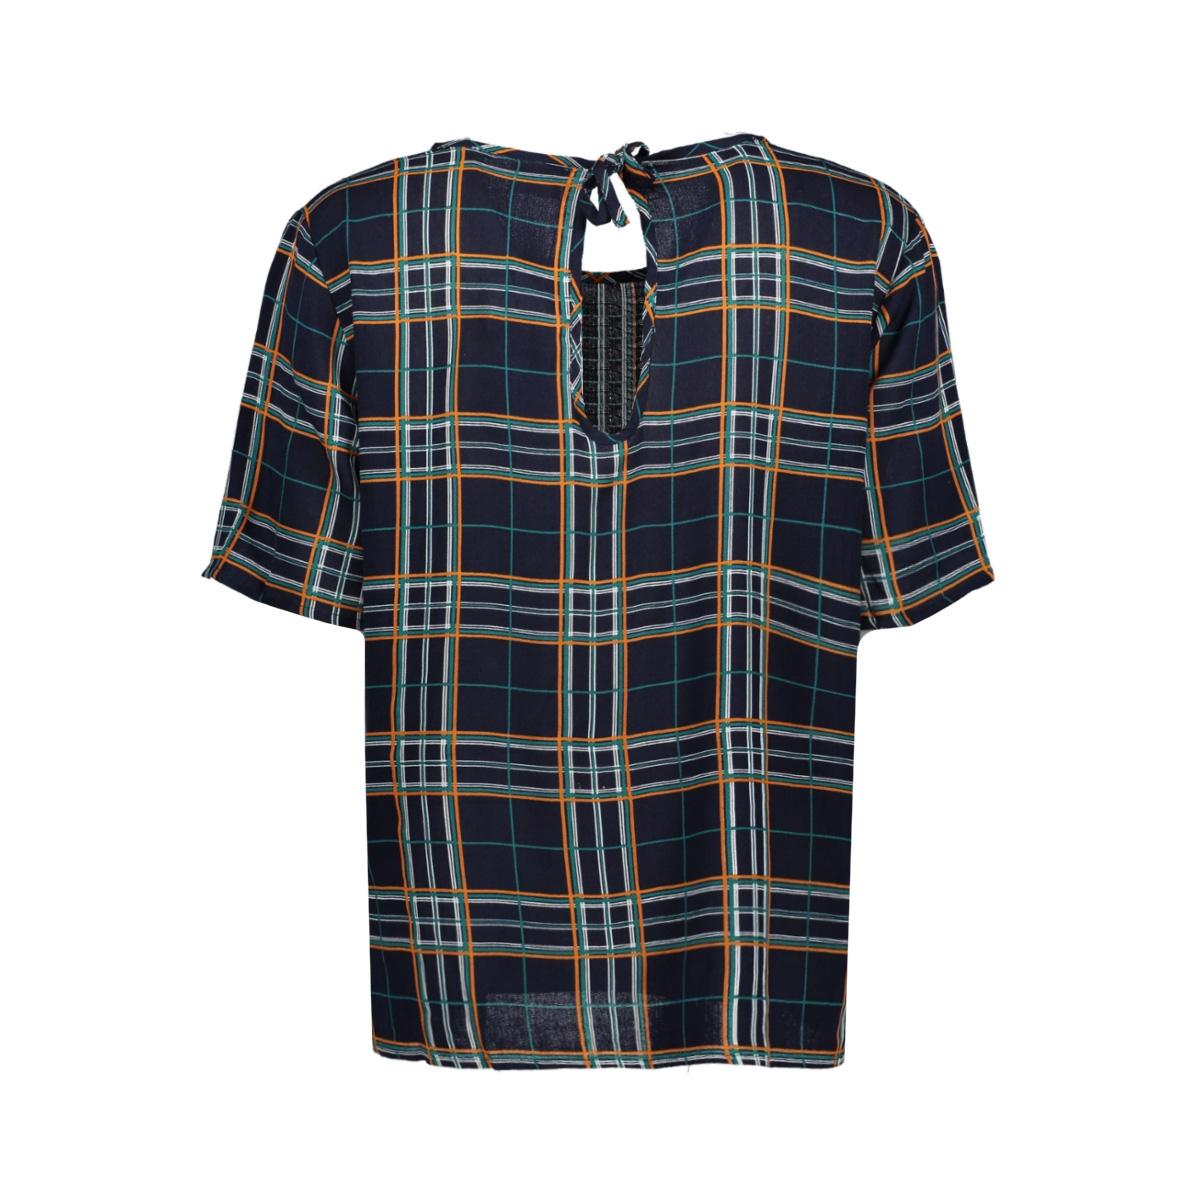 jdymarli s/s string top wvn 15181118 jacqueline de yong t-shirt sky captain/multicolor